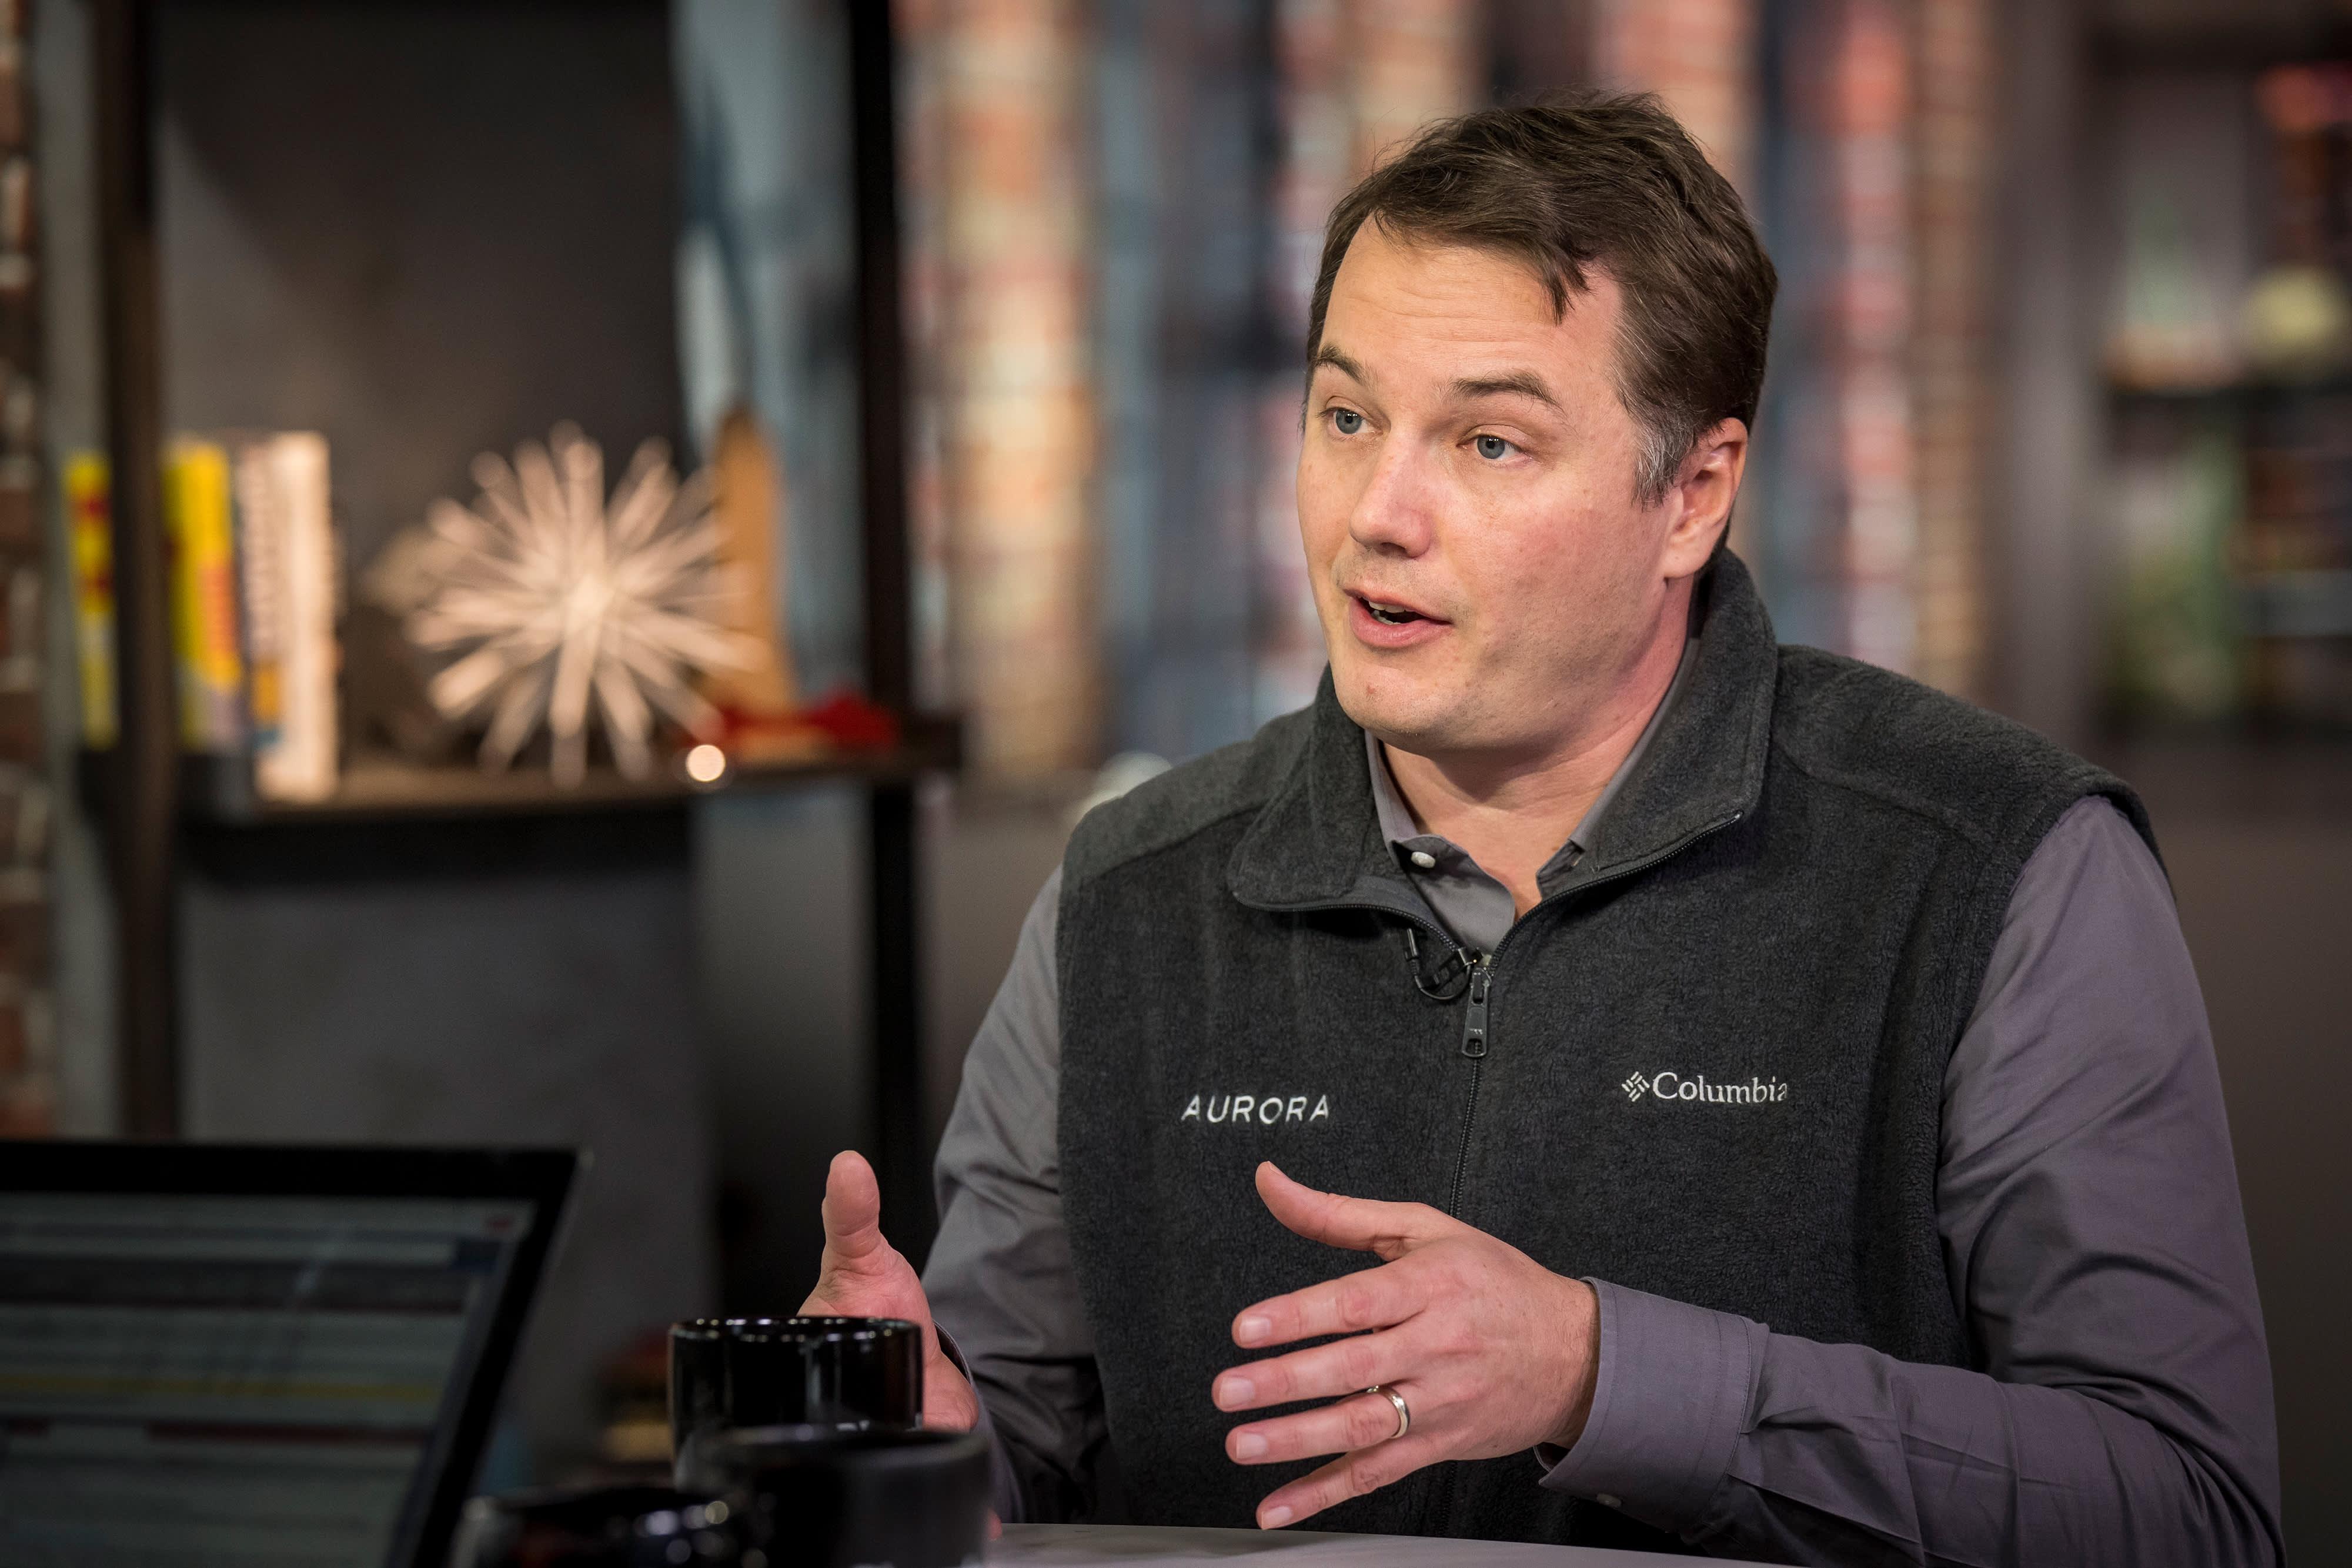 Autonomous vehicle pioneer doubles down on technology Tesla CEO Elon Musk calls 'freaking stupid'